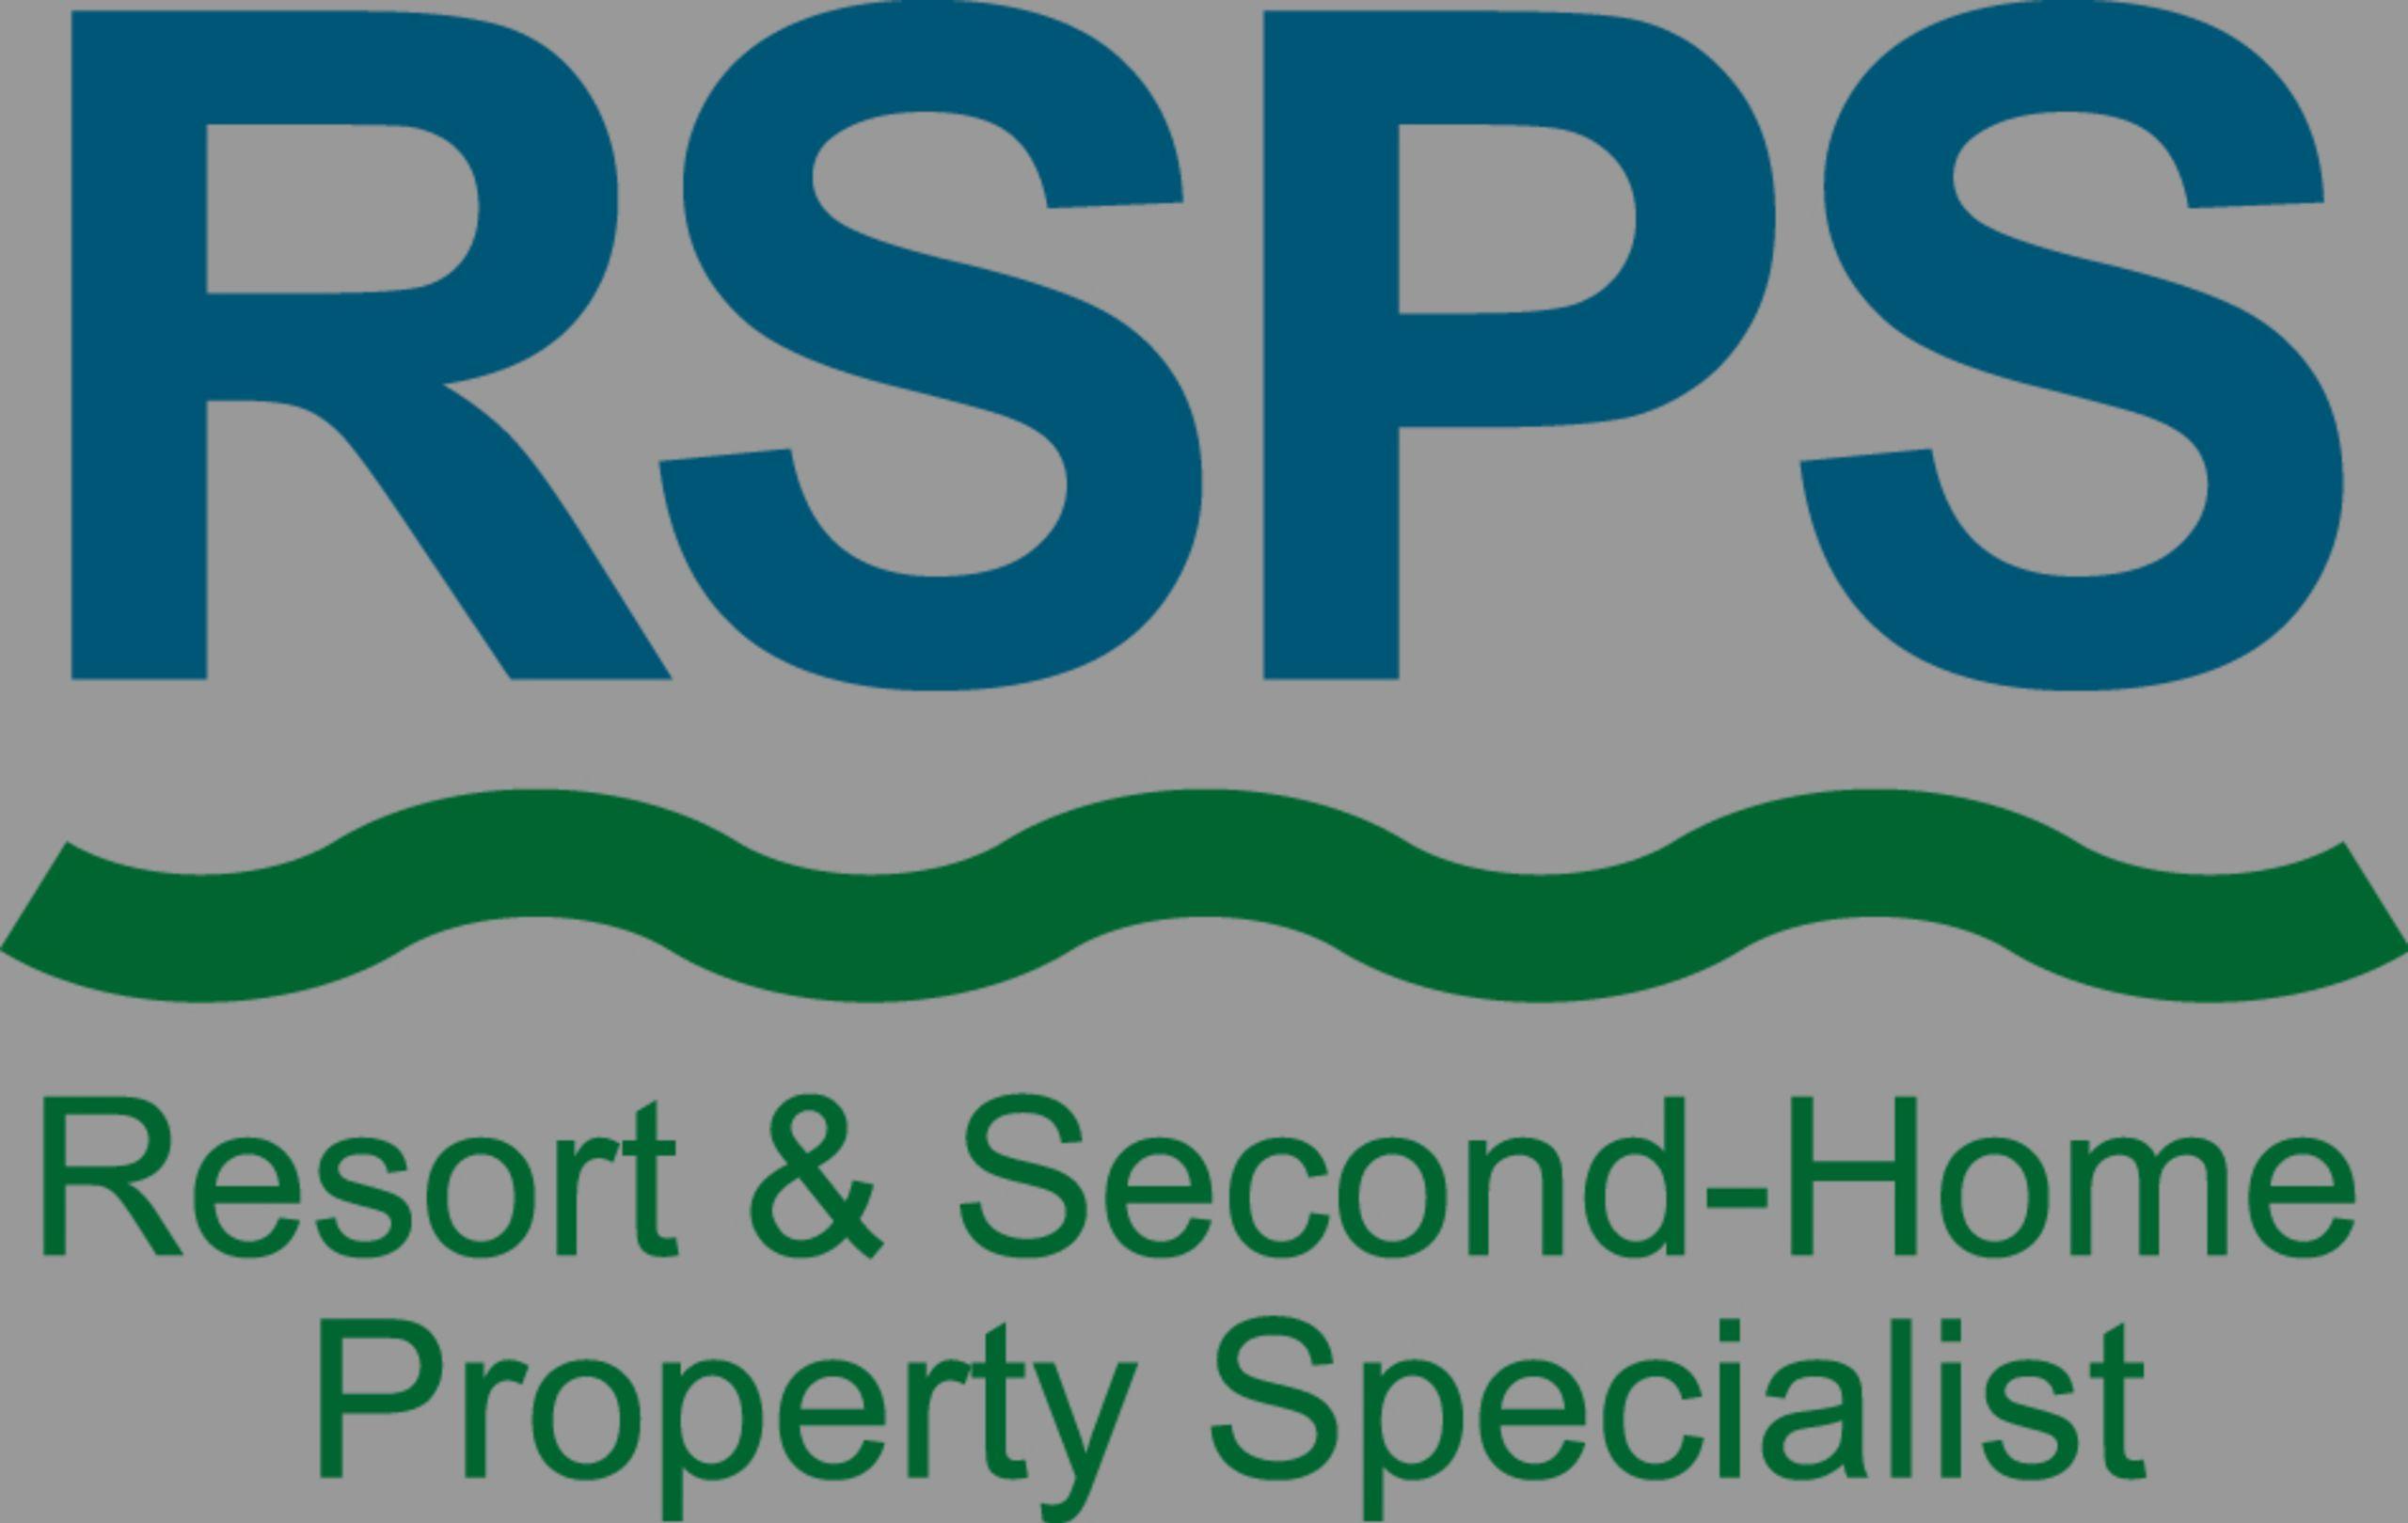 Christine O'Brien earned the RSPS Designation